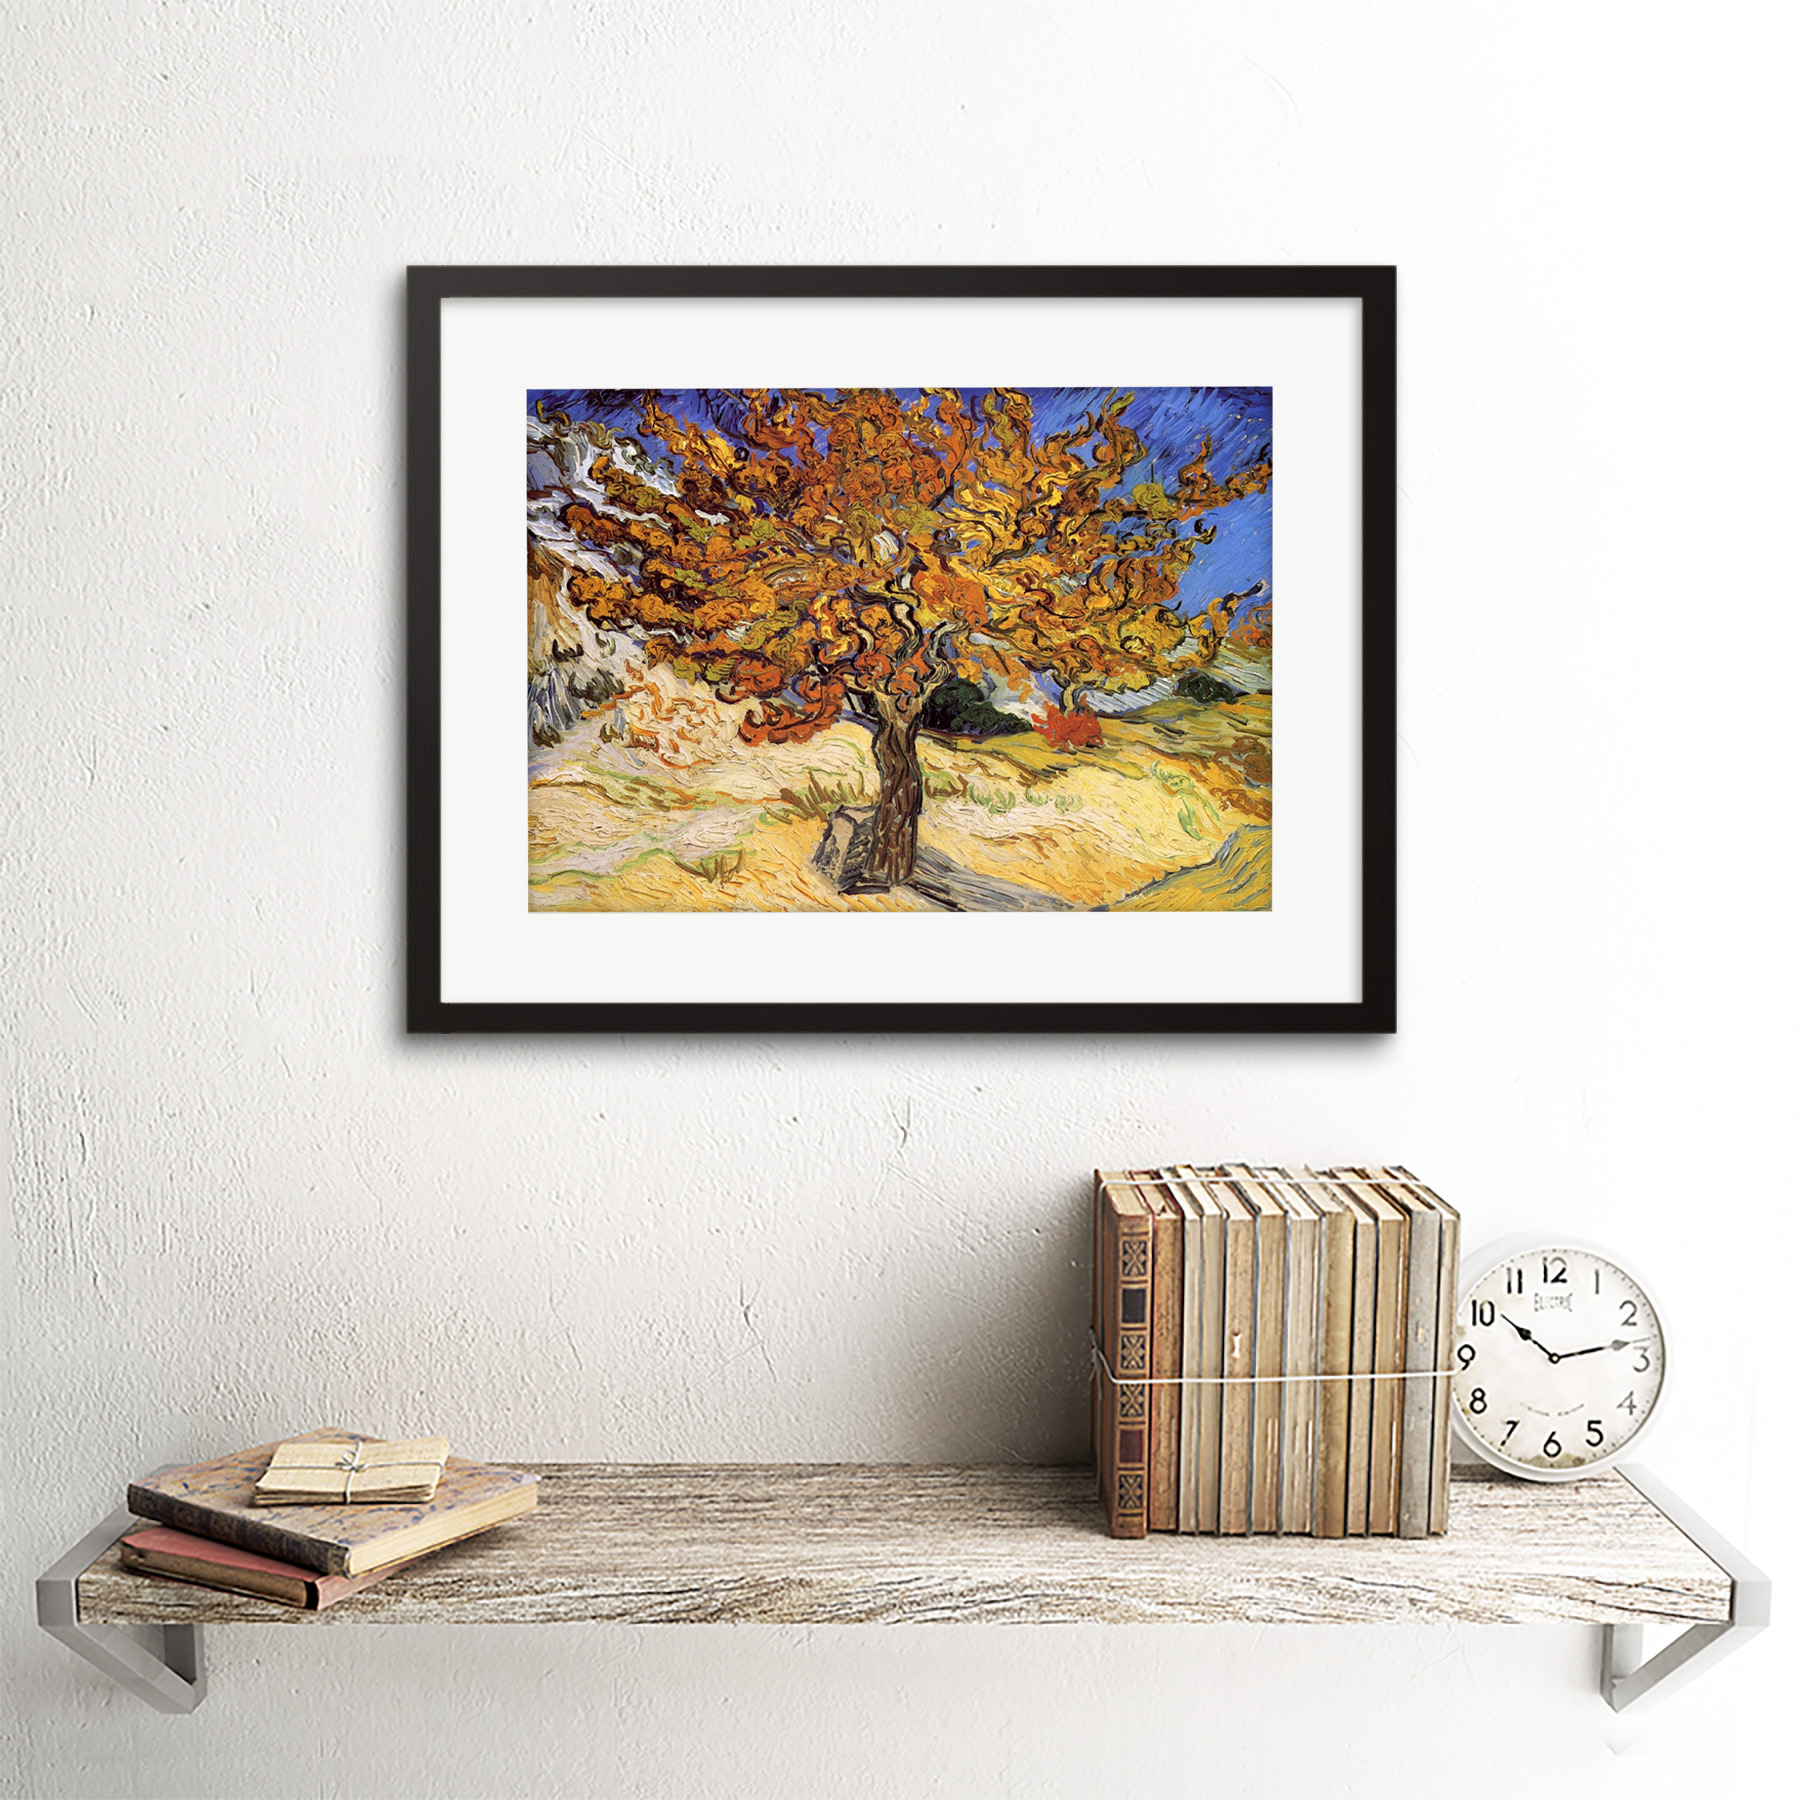 thumbnail 3 - Van-Gogh-Mulberry-Tree-1889-Old-Master-Framed-Wall-Art-Print